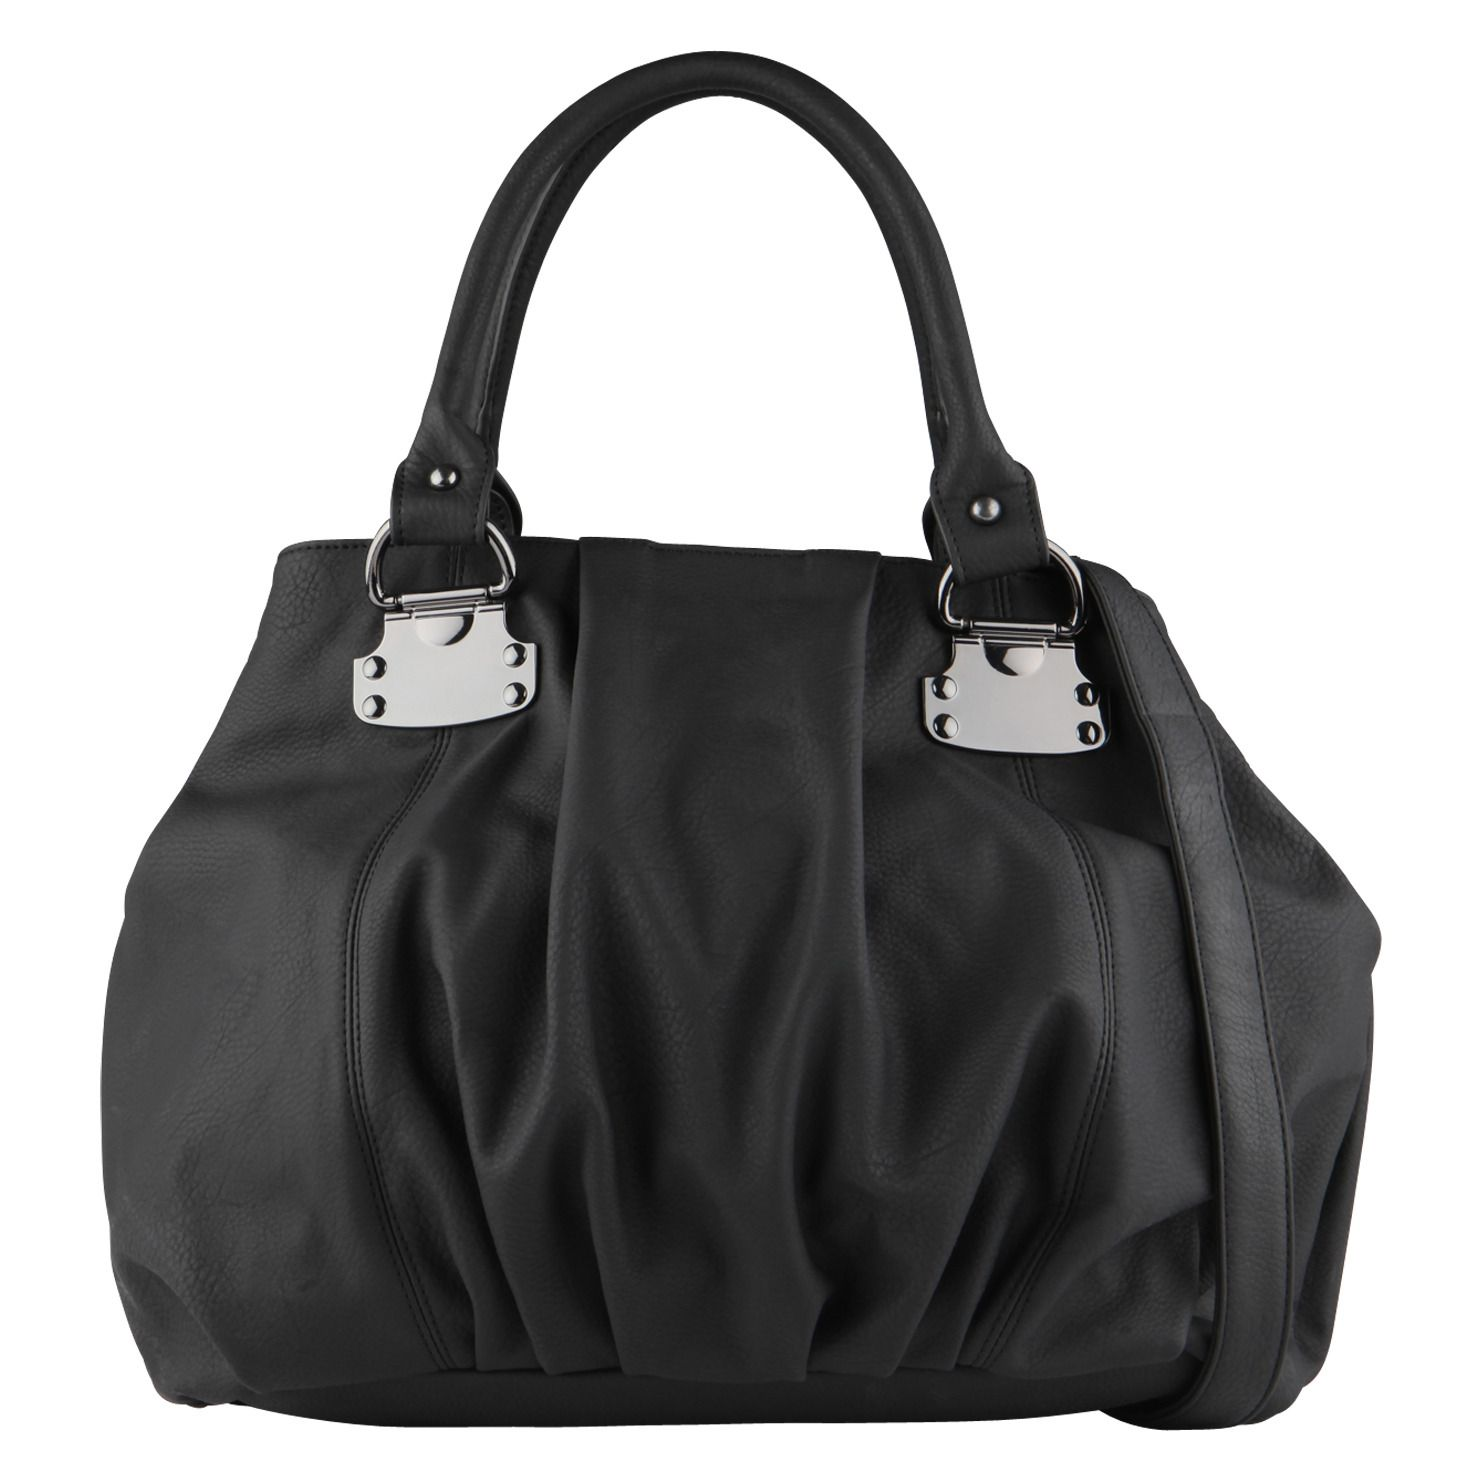 GERANIUM - handbags's shoulder bags & totes for sale at ALDO Shoes ...